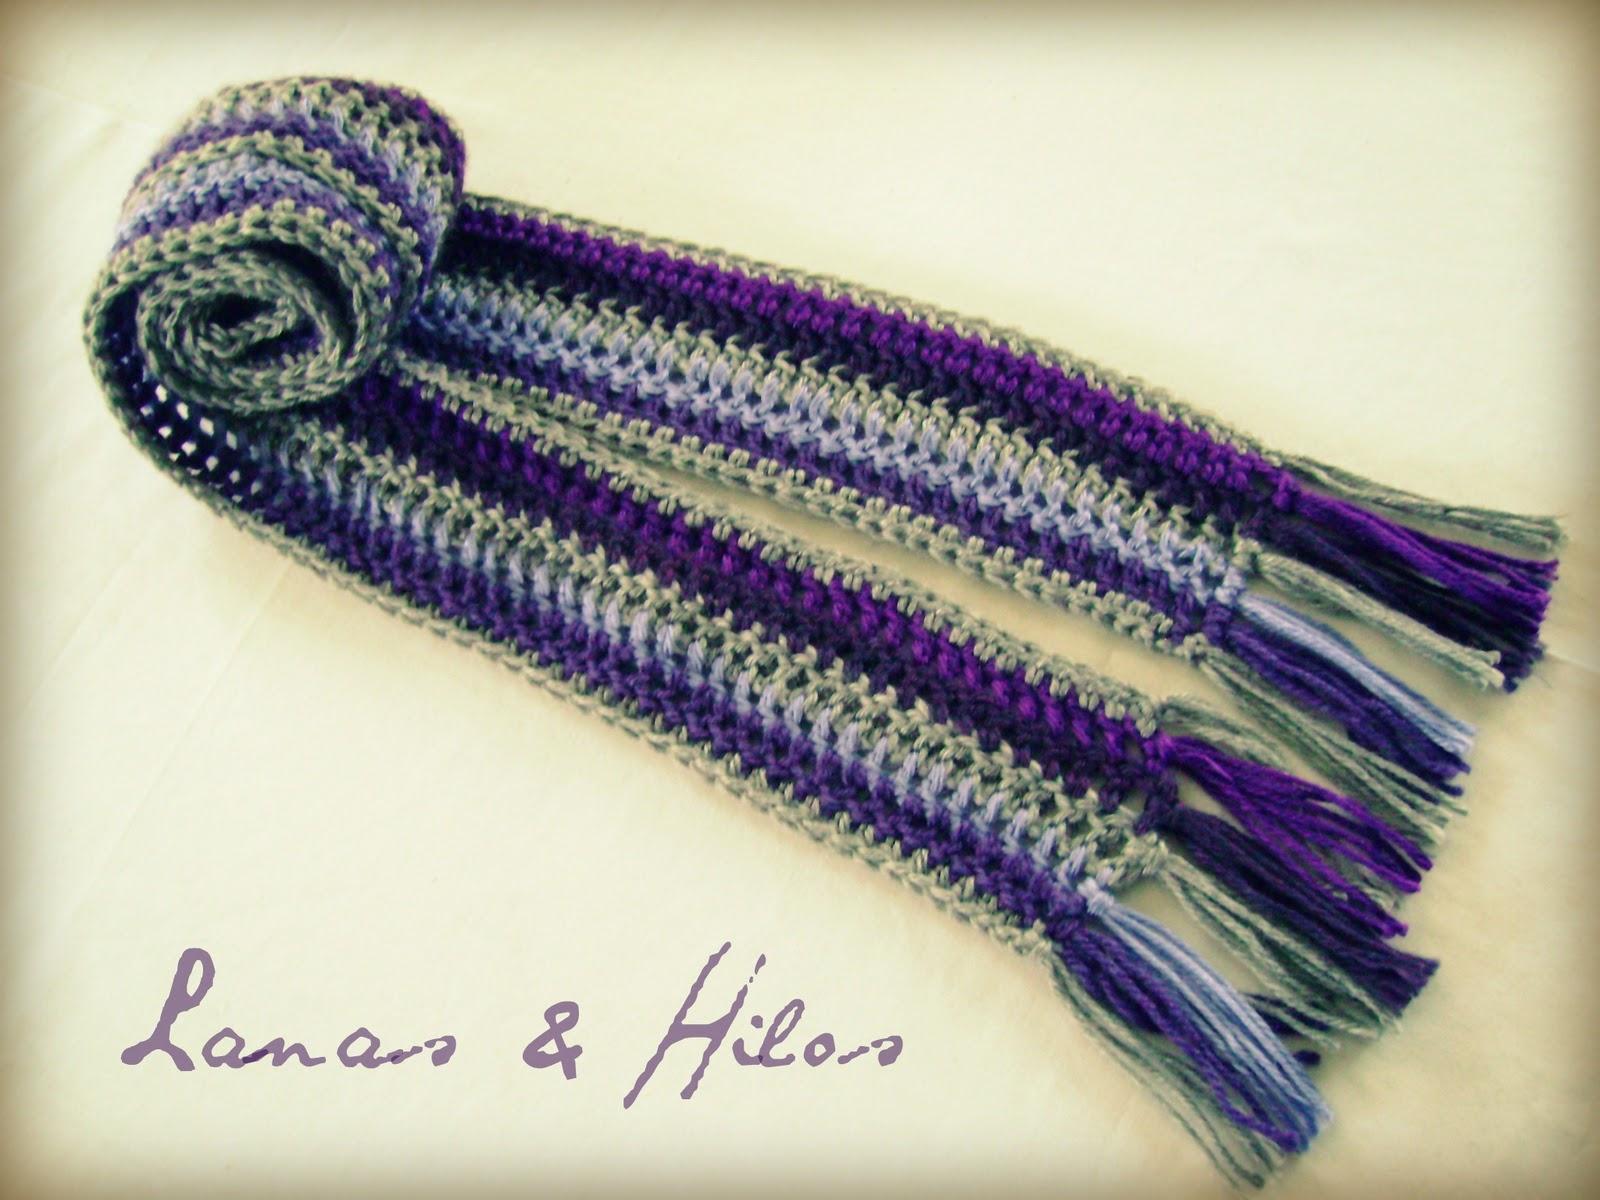 Crochet Scarf Pattern Vertical Stripes : Lanas Hilos: My Patterns